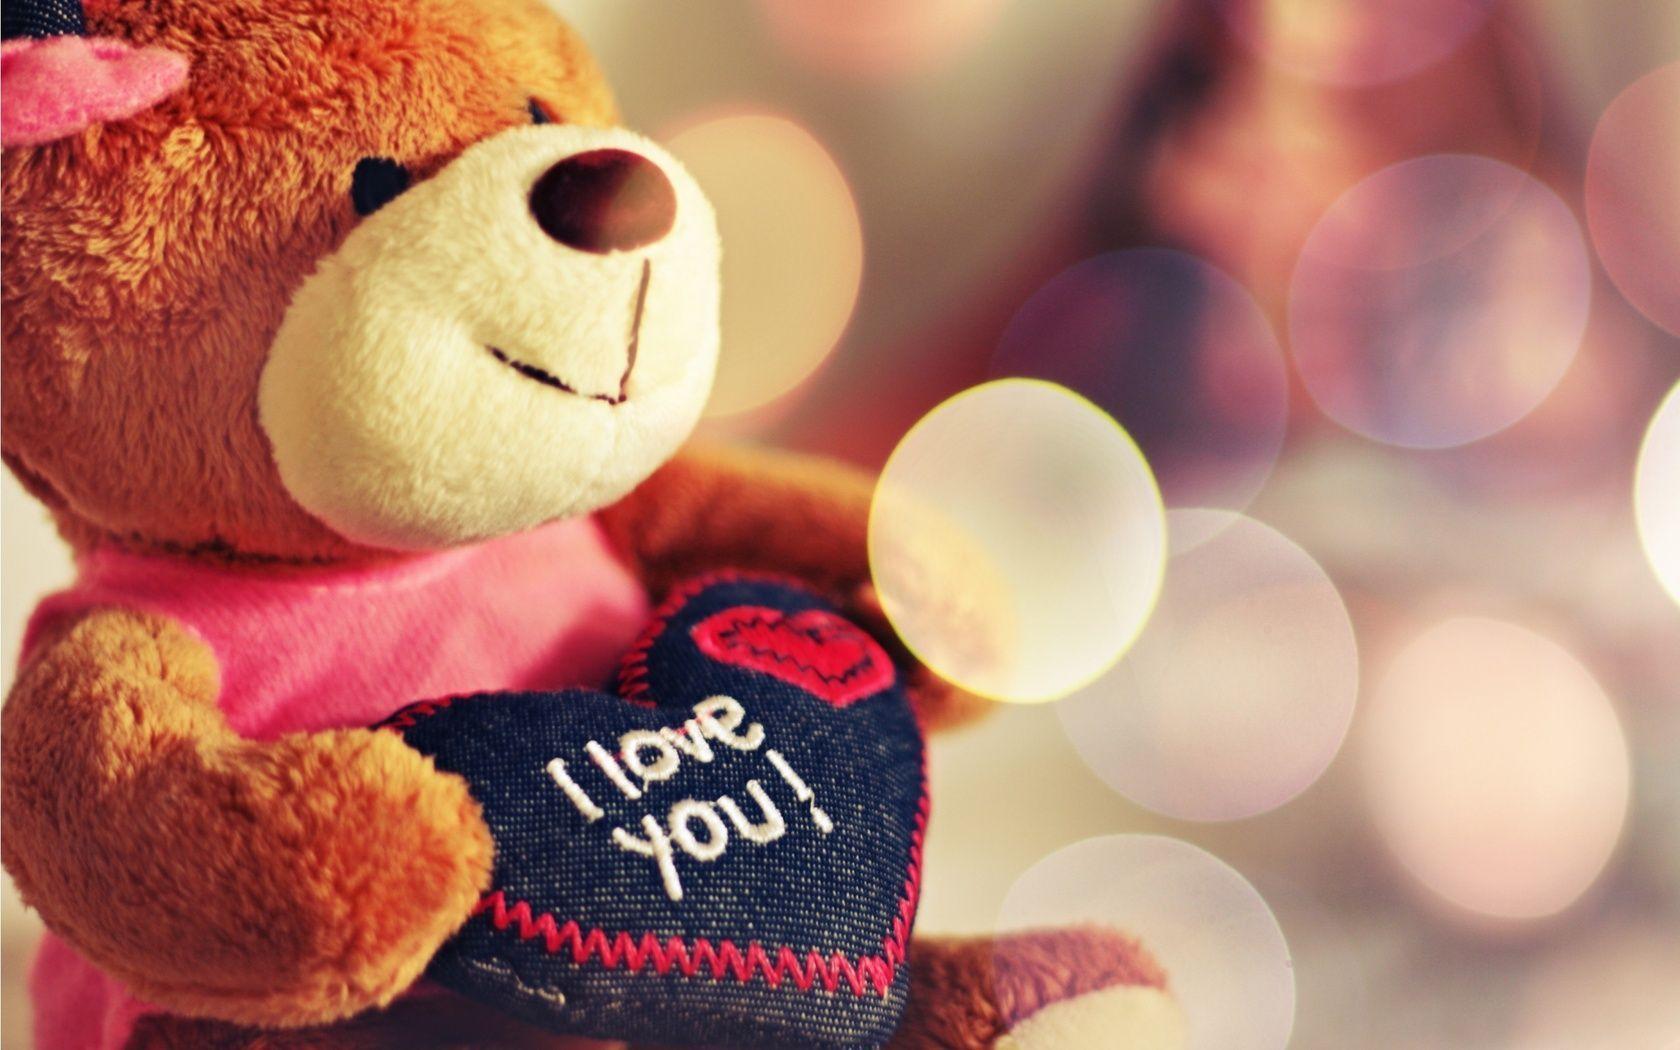 Cute Love Heart Wallpaper: Wallpapers Heart Love You